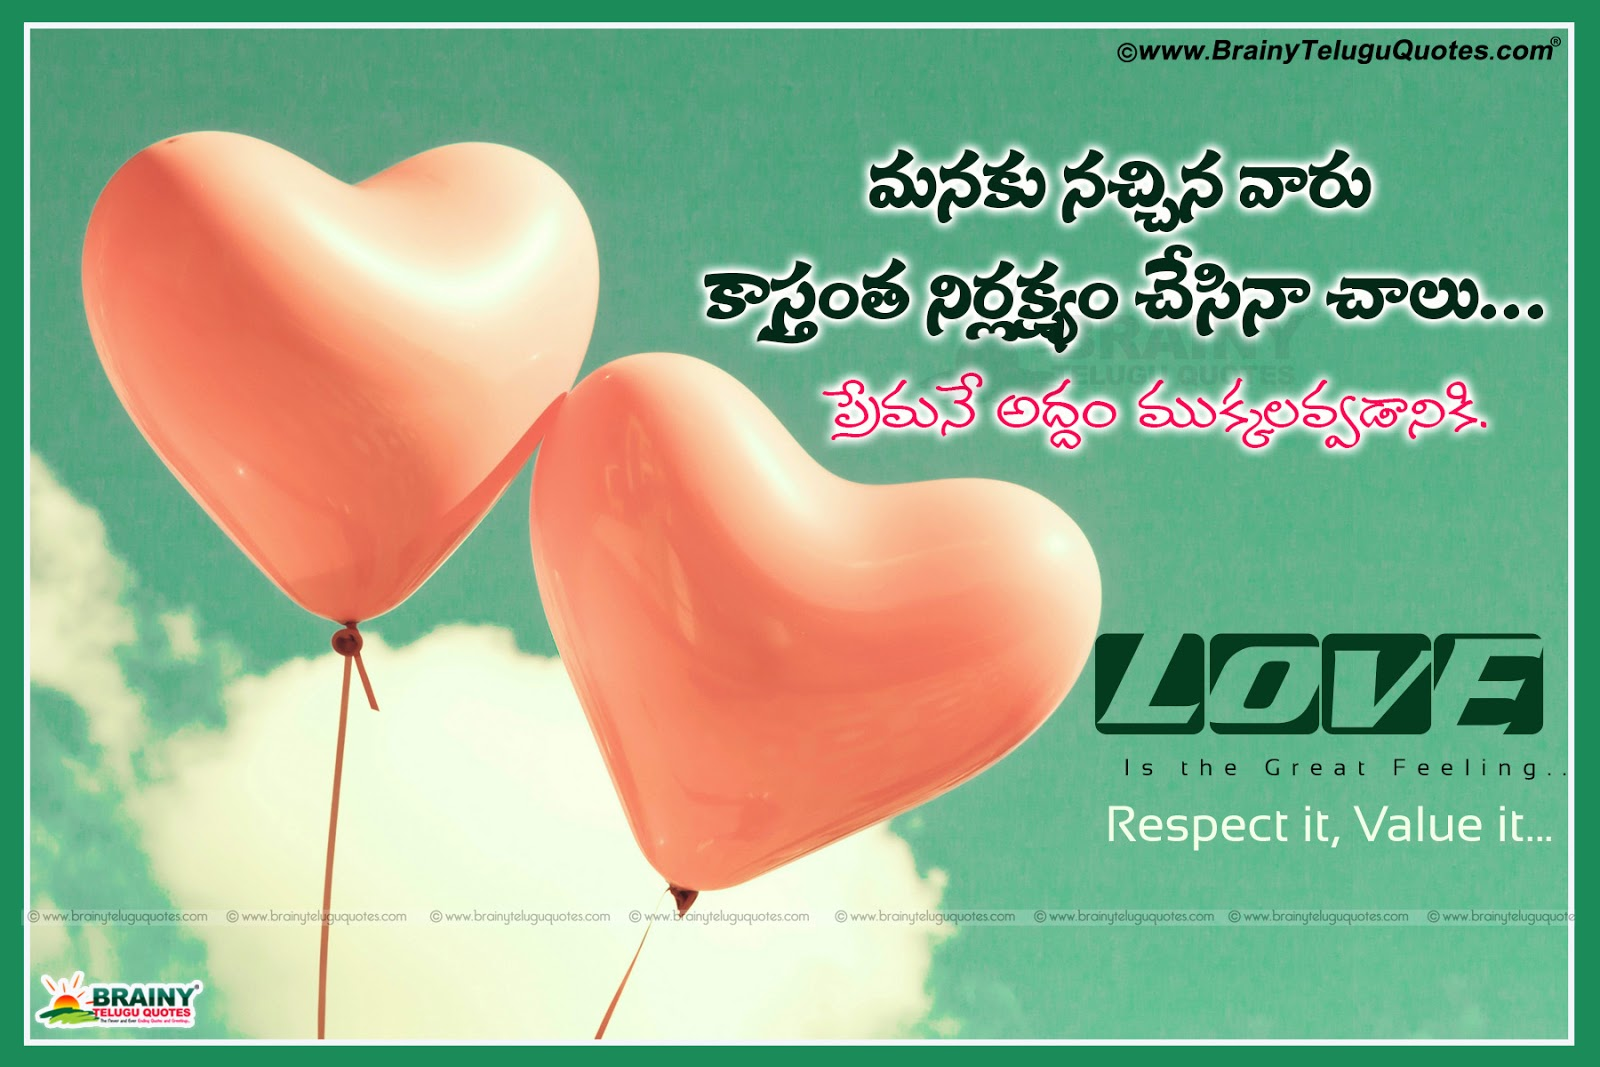 Here Is A Best Telugu Heart Touching Love Quotes, Heart - Heart Touching Telugu Love Quotes - HD Wallpaper